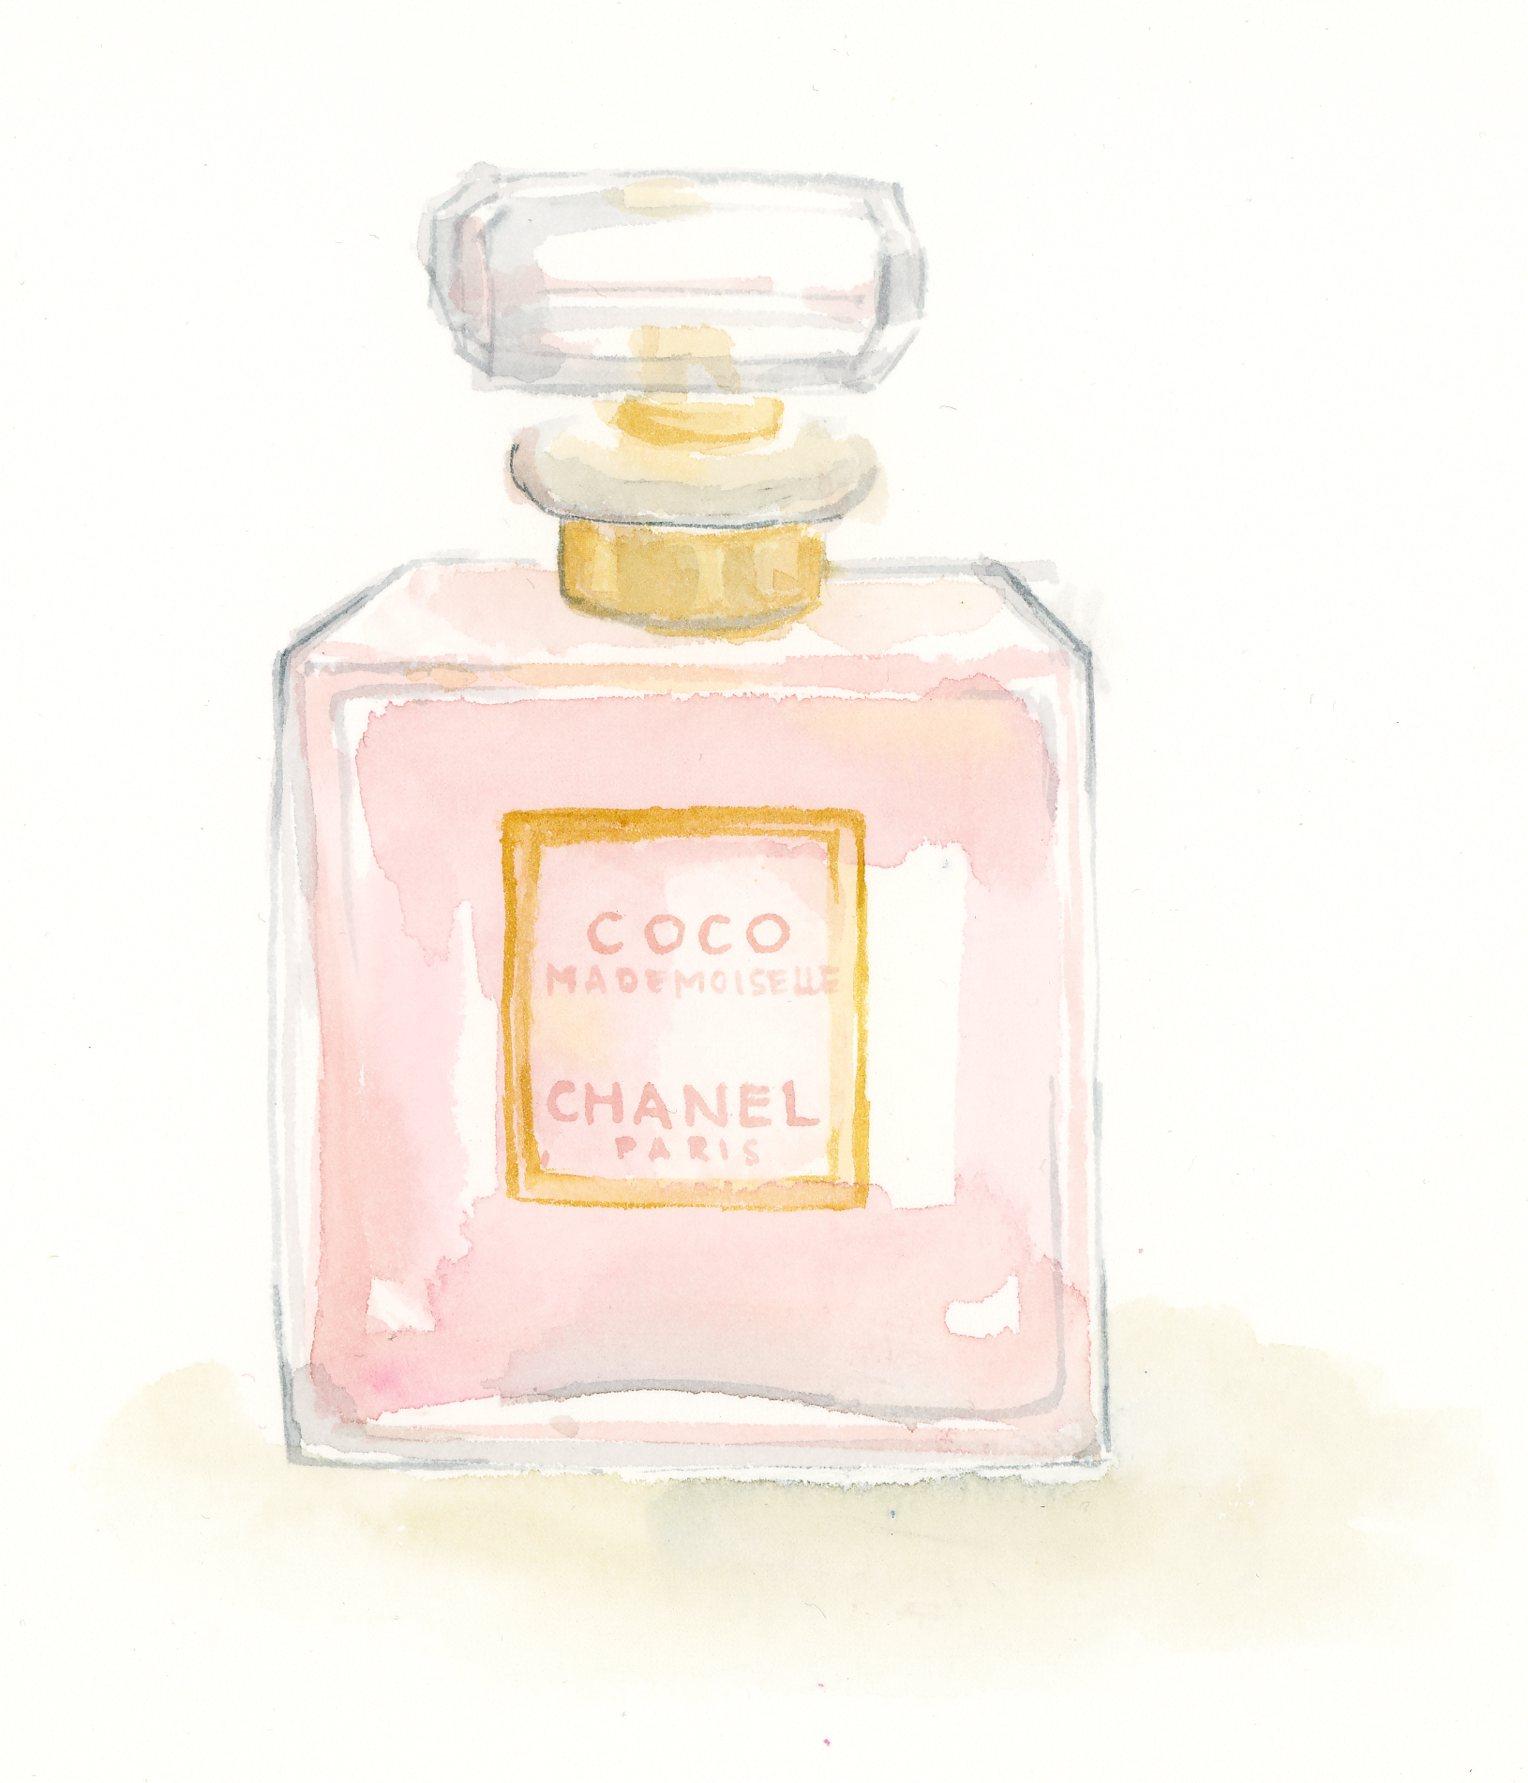 mademoiselle chanel338.jpg